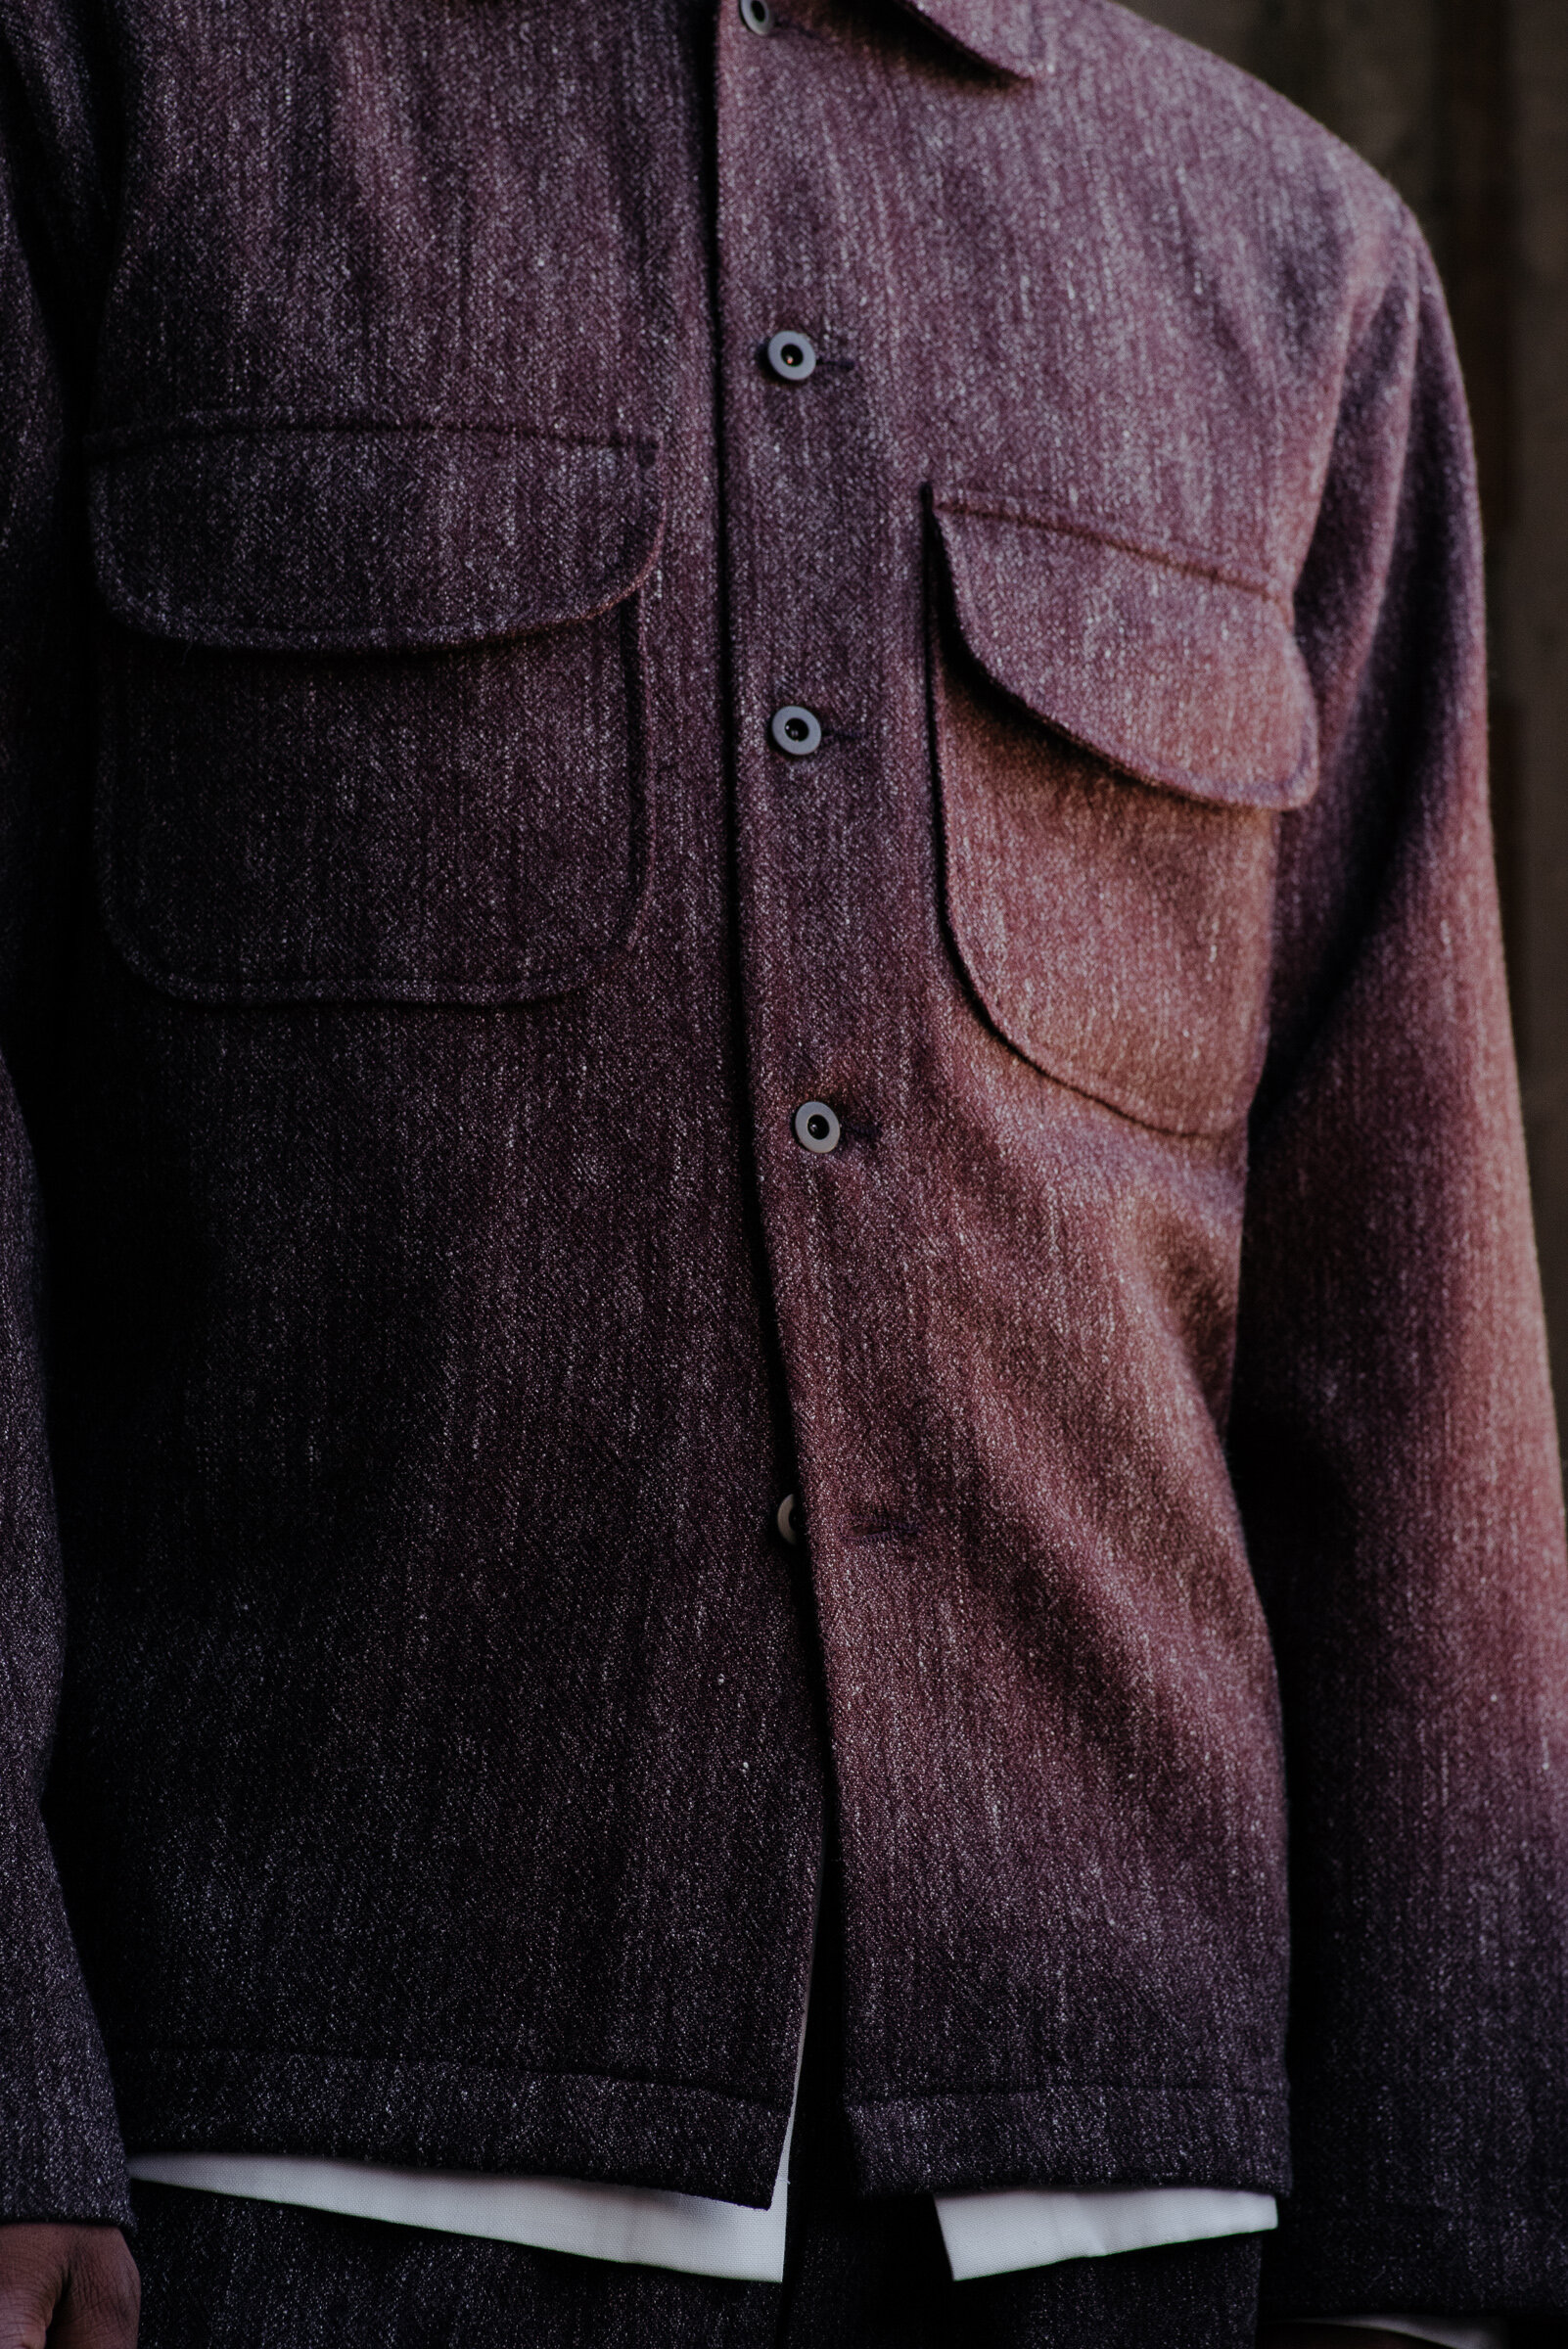 evan-kinori-field-shirt-wool-linen-woven-japan-8